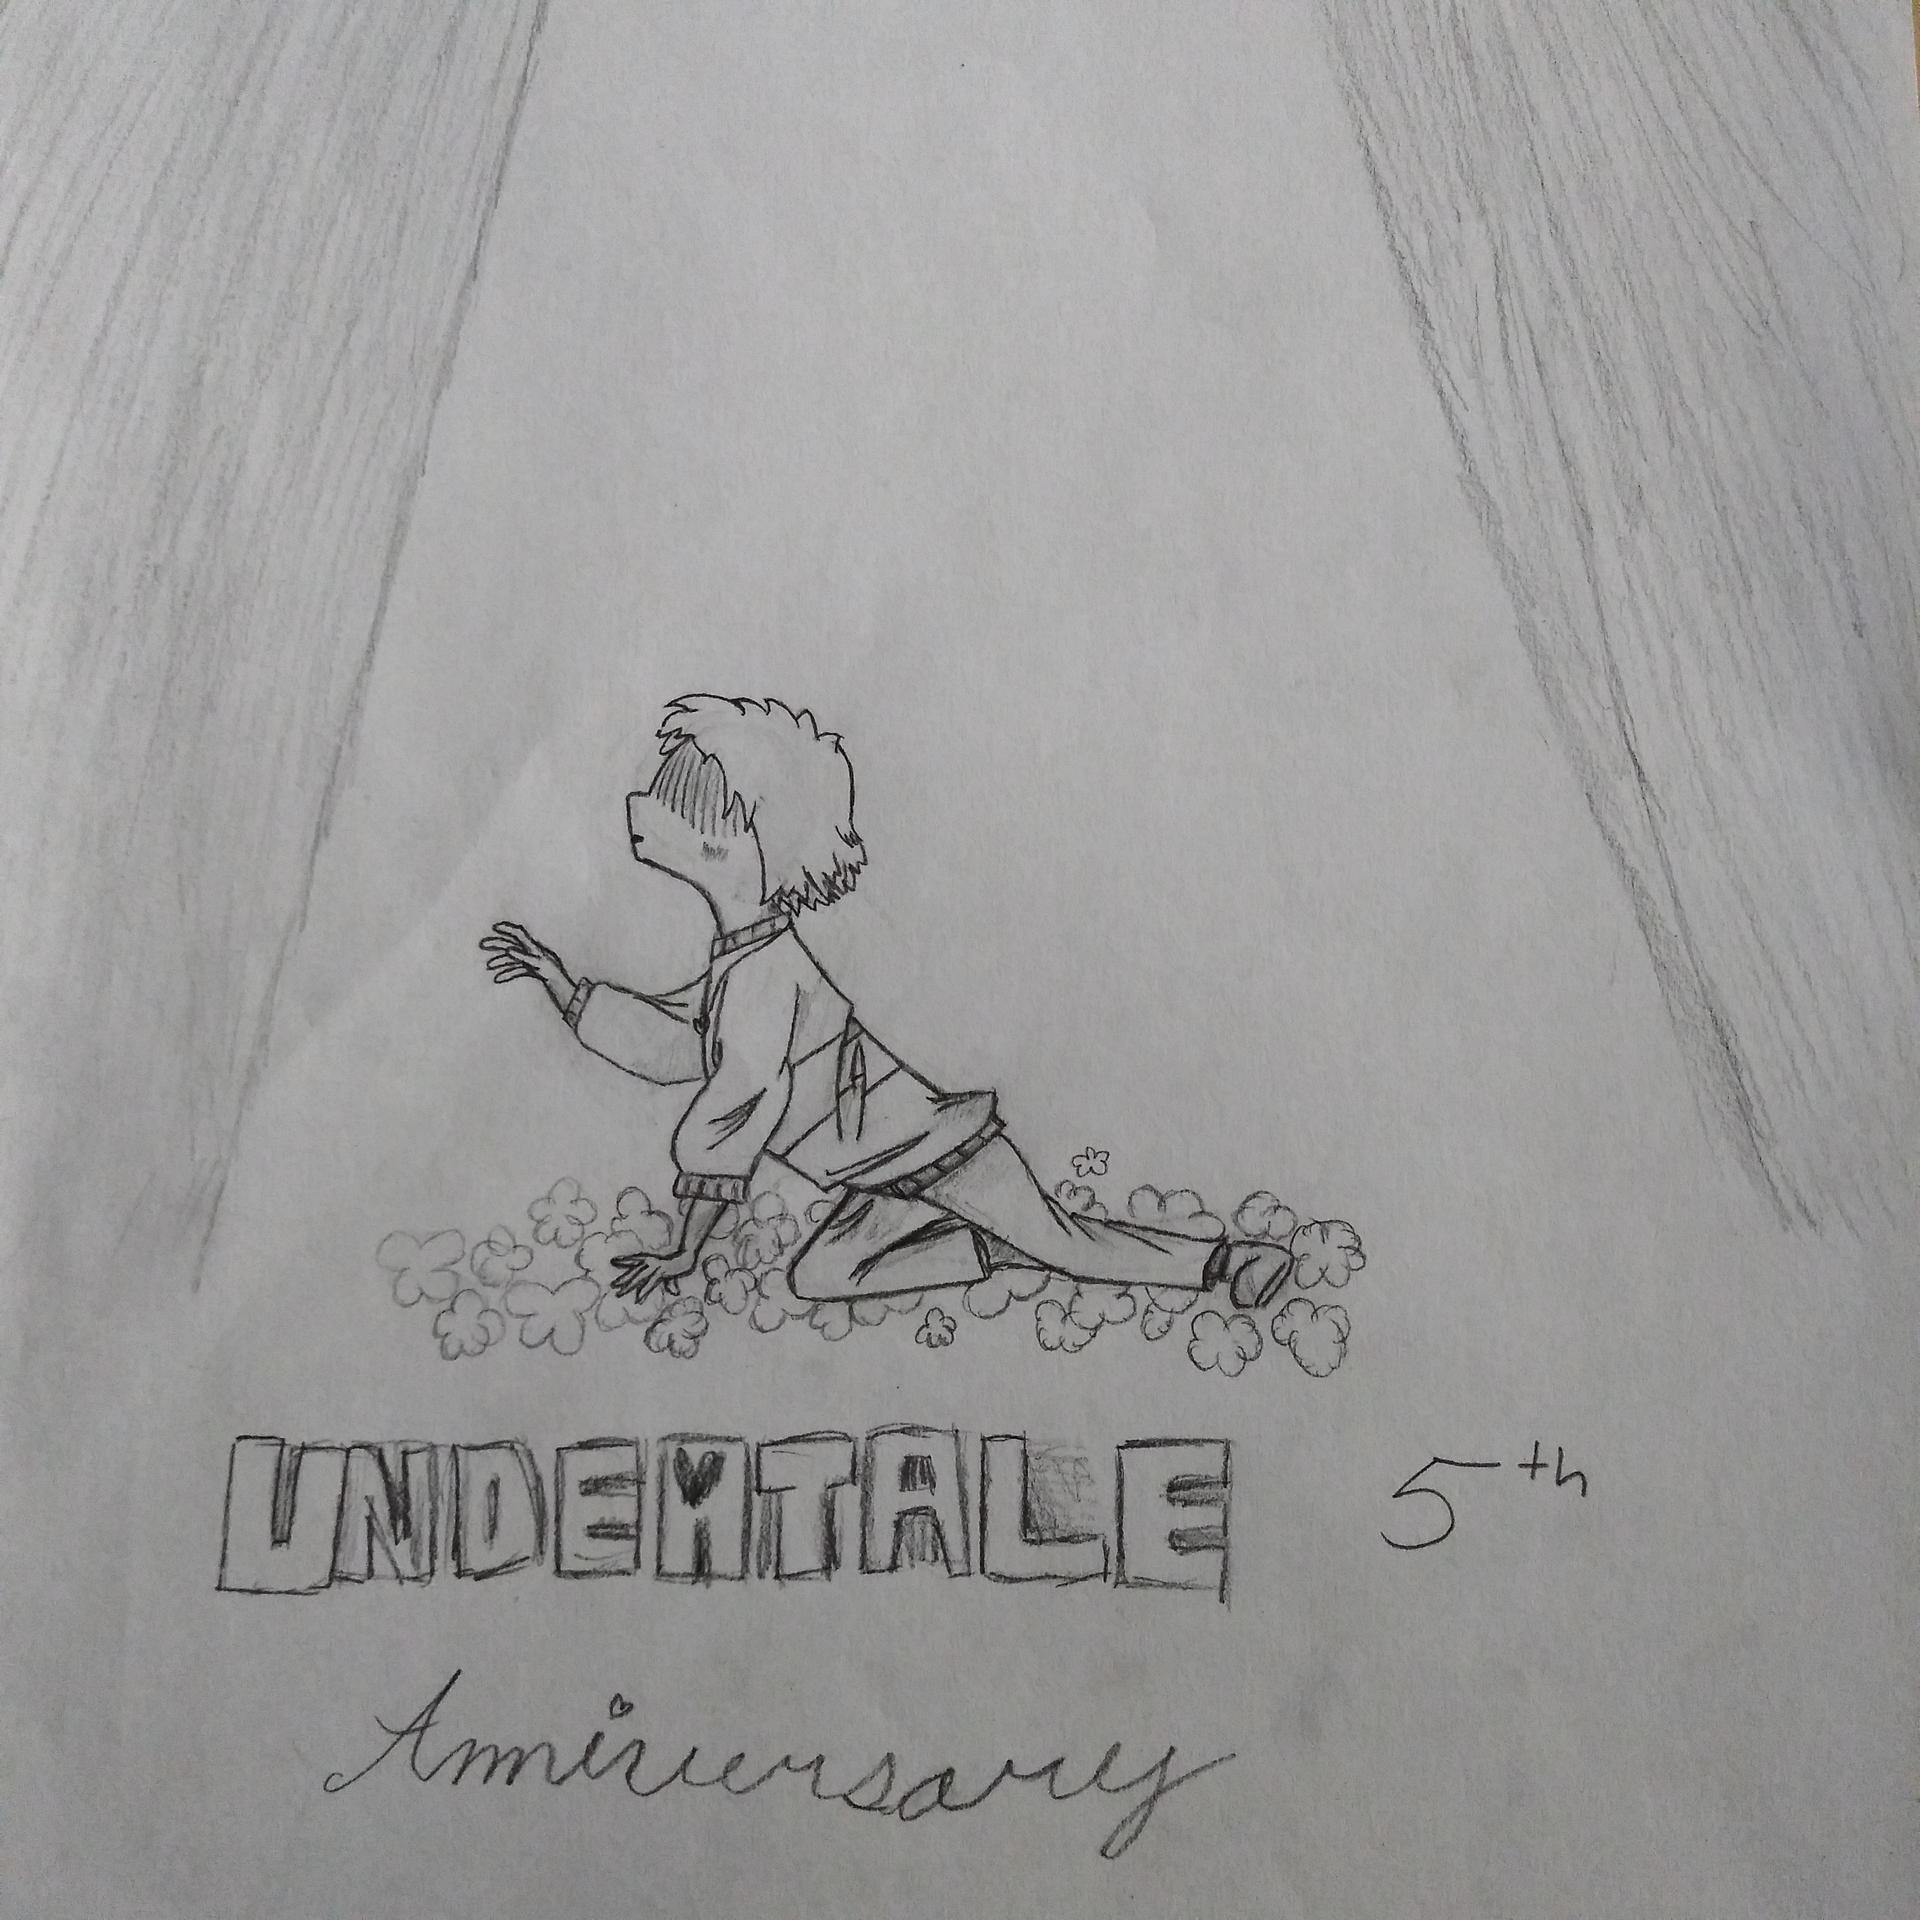 Undertale 5th Anniversary!